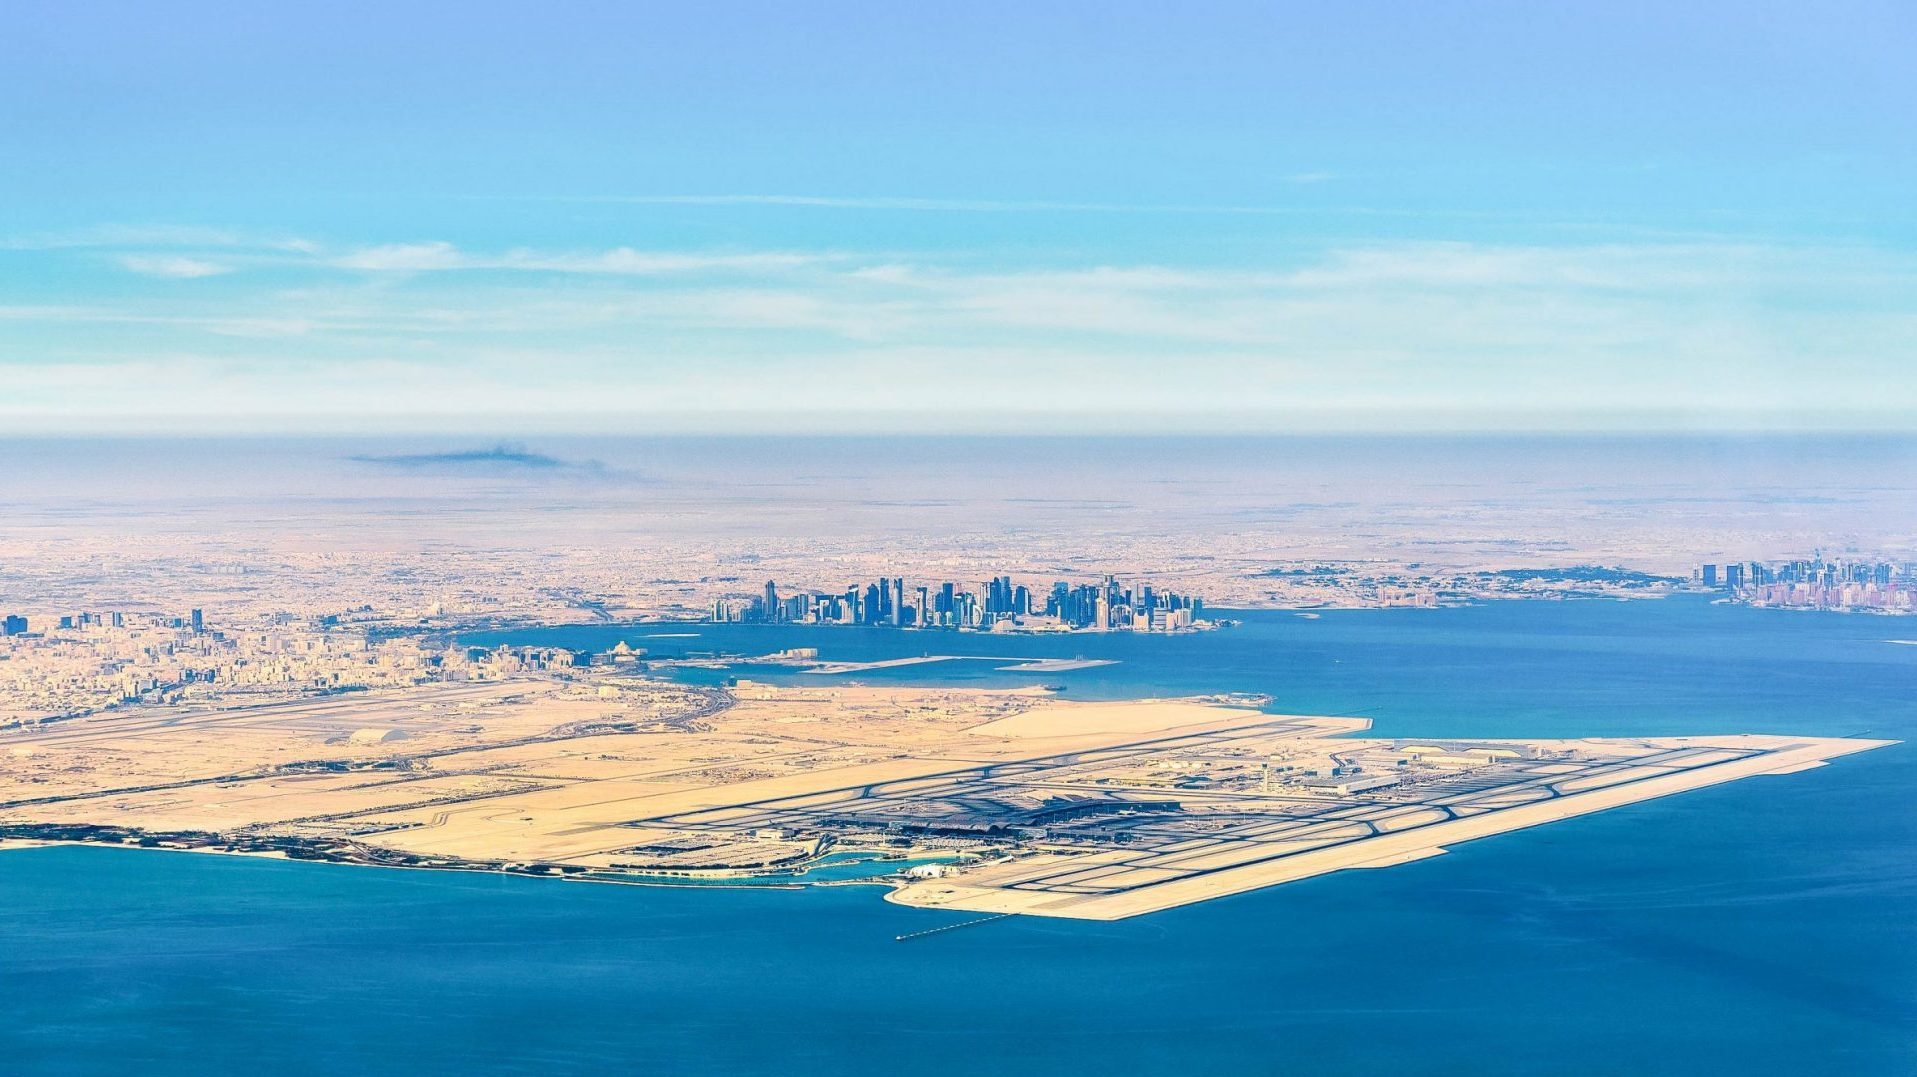 Hamad International Airport - Airside Capacity Assessment - shutterstock_1030271686